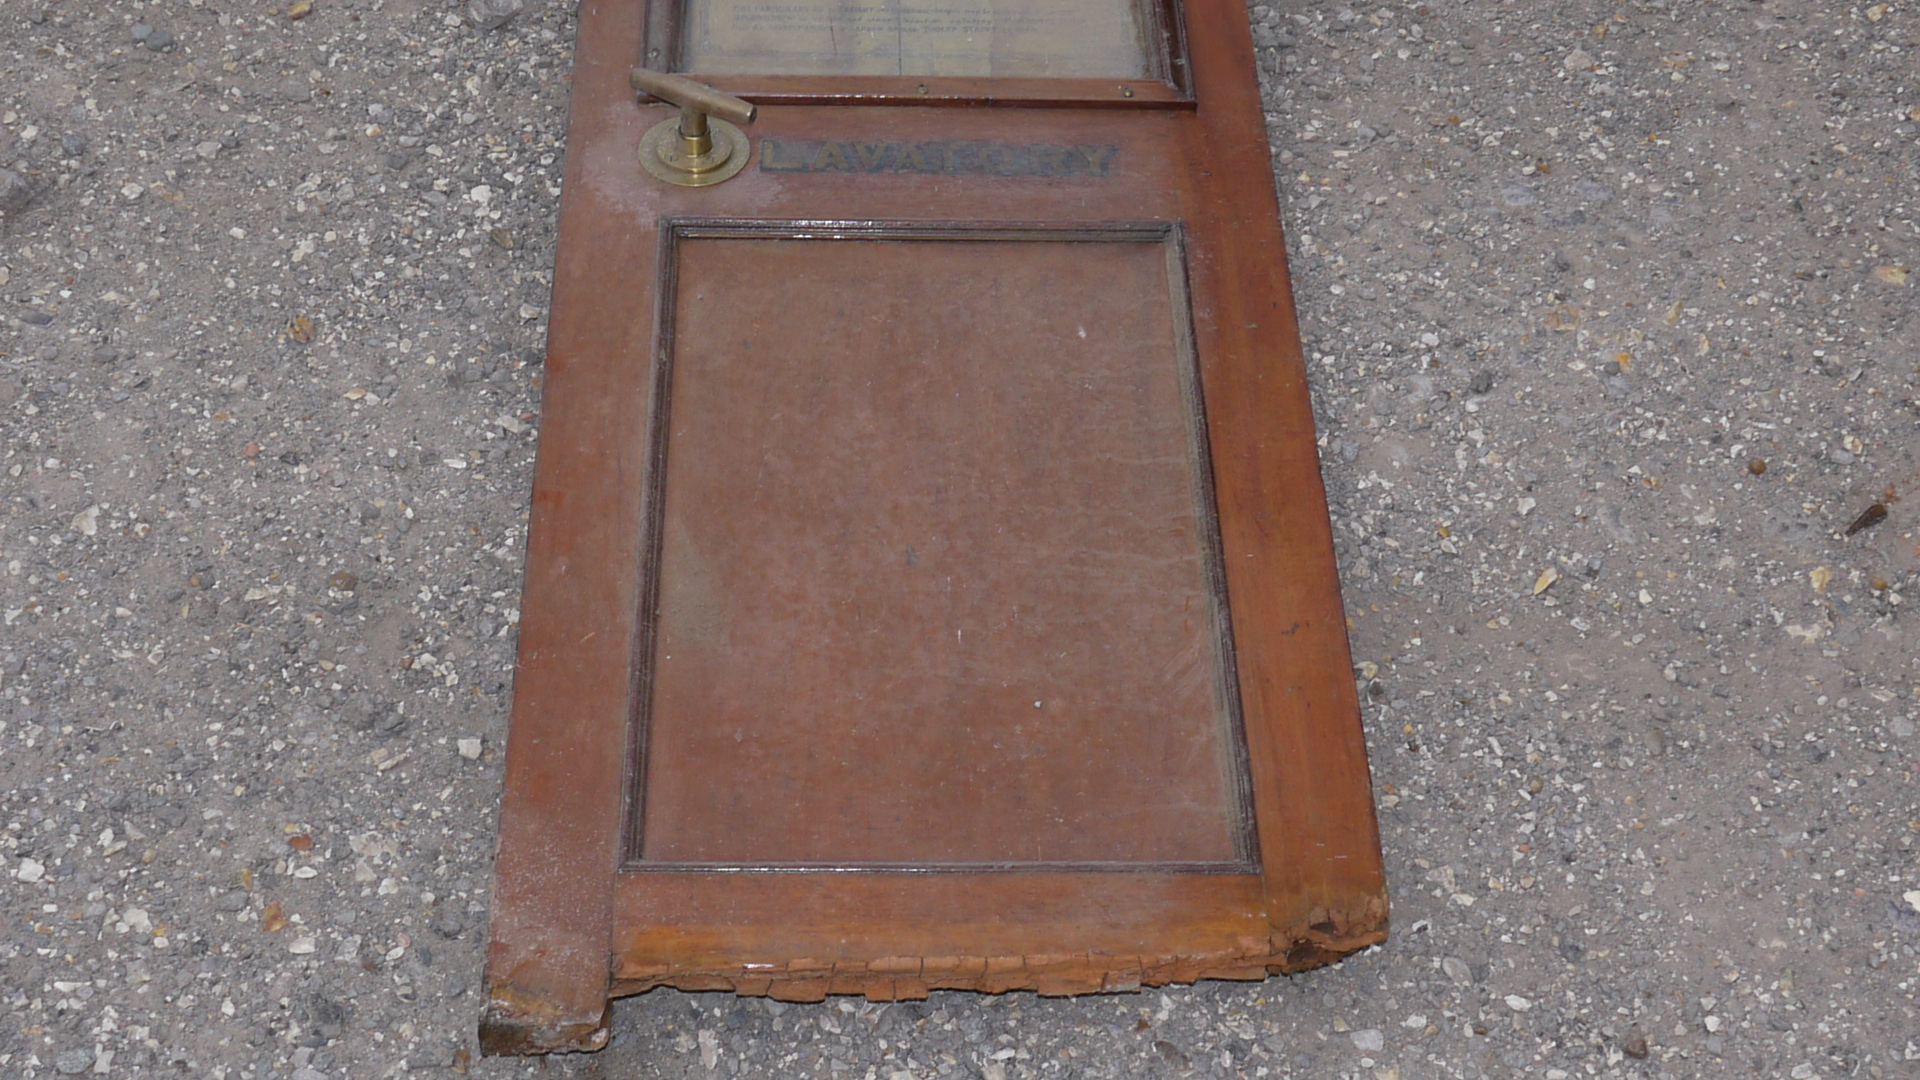 Lot 769 - An Edwardian Railway Carriage Lavatory Door, teak door with upper glazed panel inset with poster